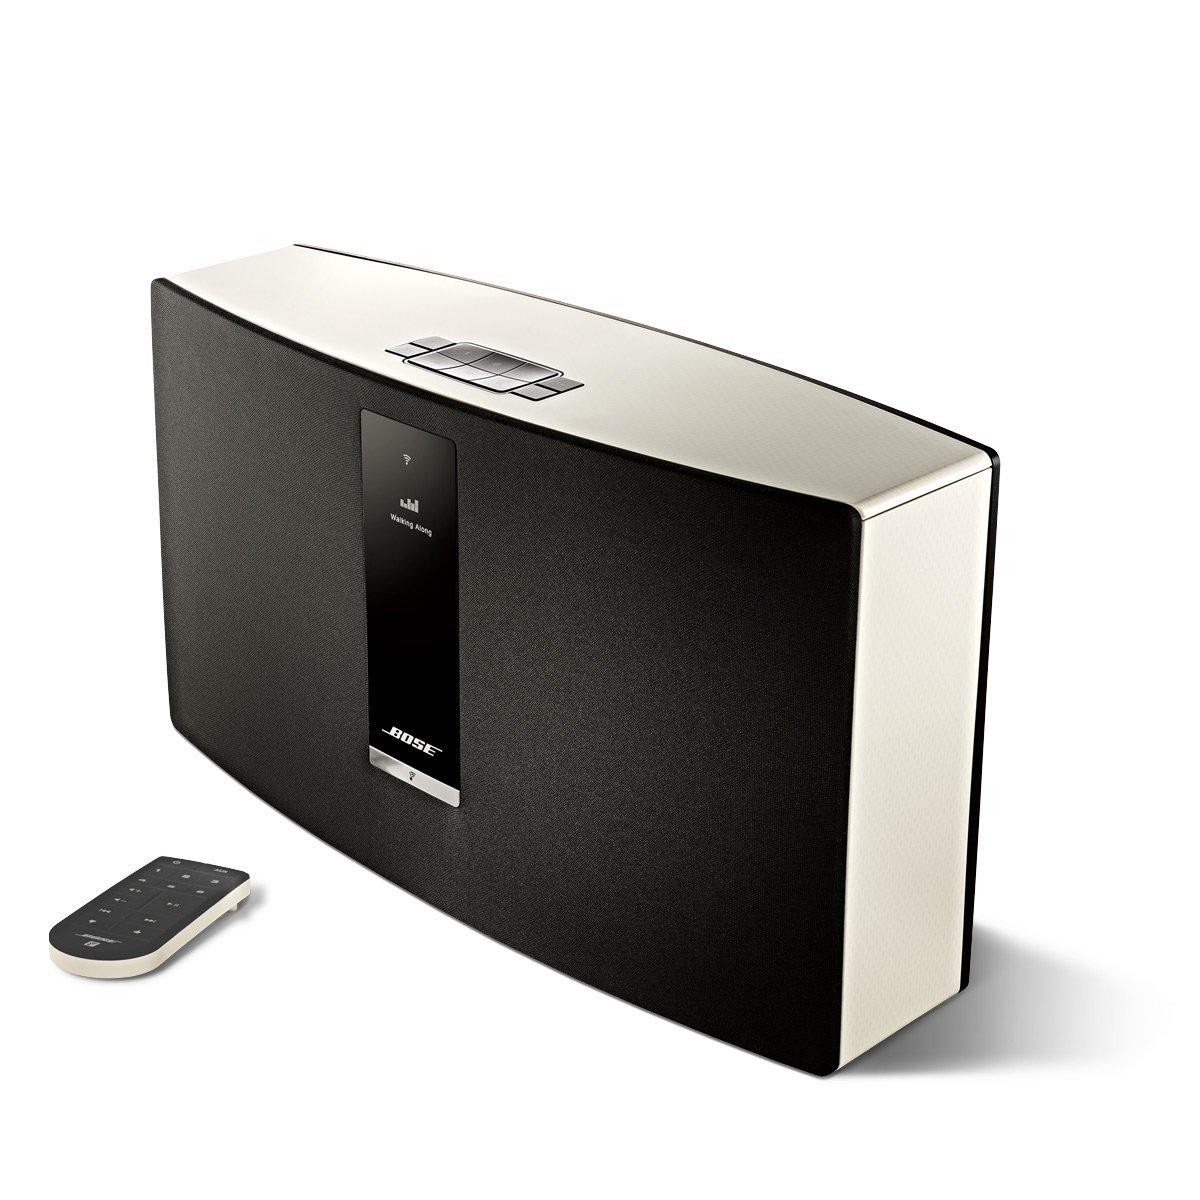 bose soundtouch mit code kurze zeit 100 euro sparen itopnews. Black Bedroom Furniture Sets. Home Design Ideas